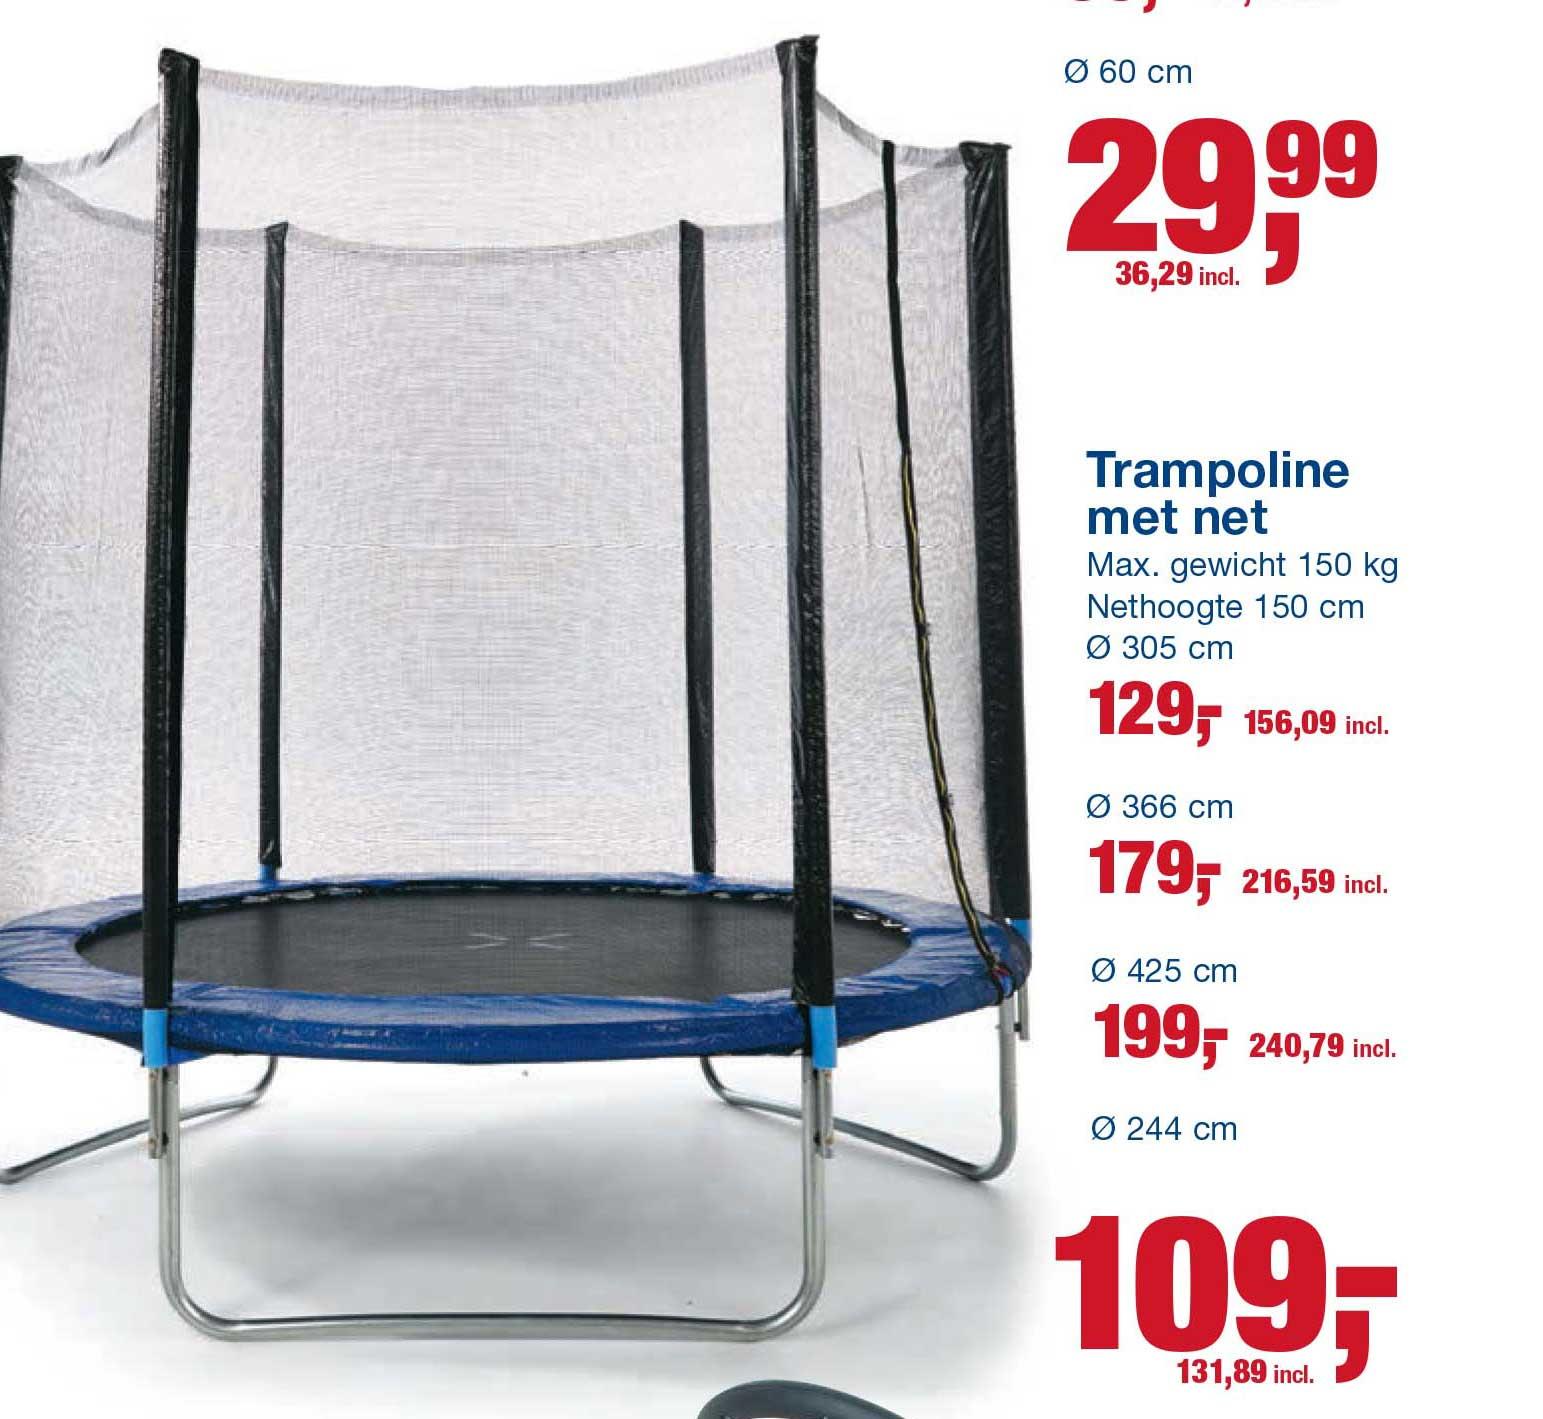 Makro Trampoline Met Net